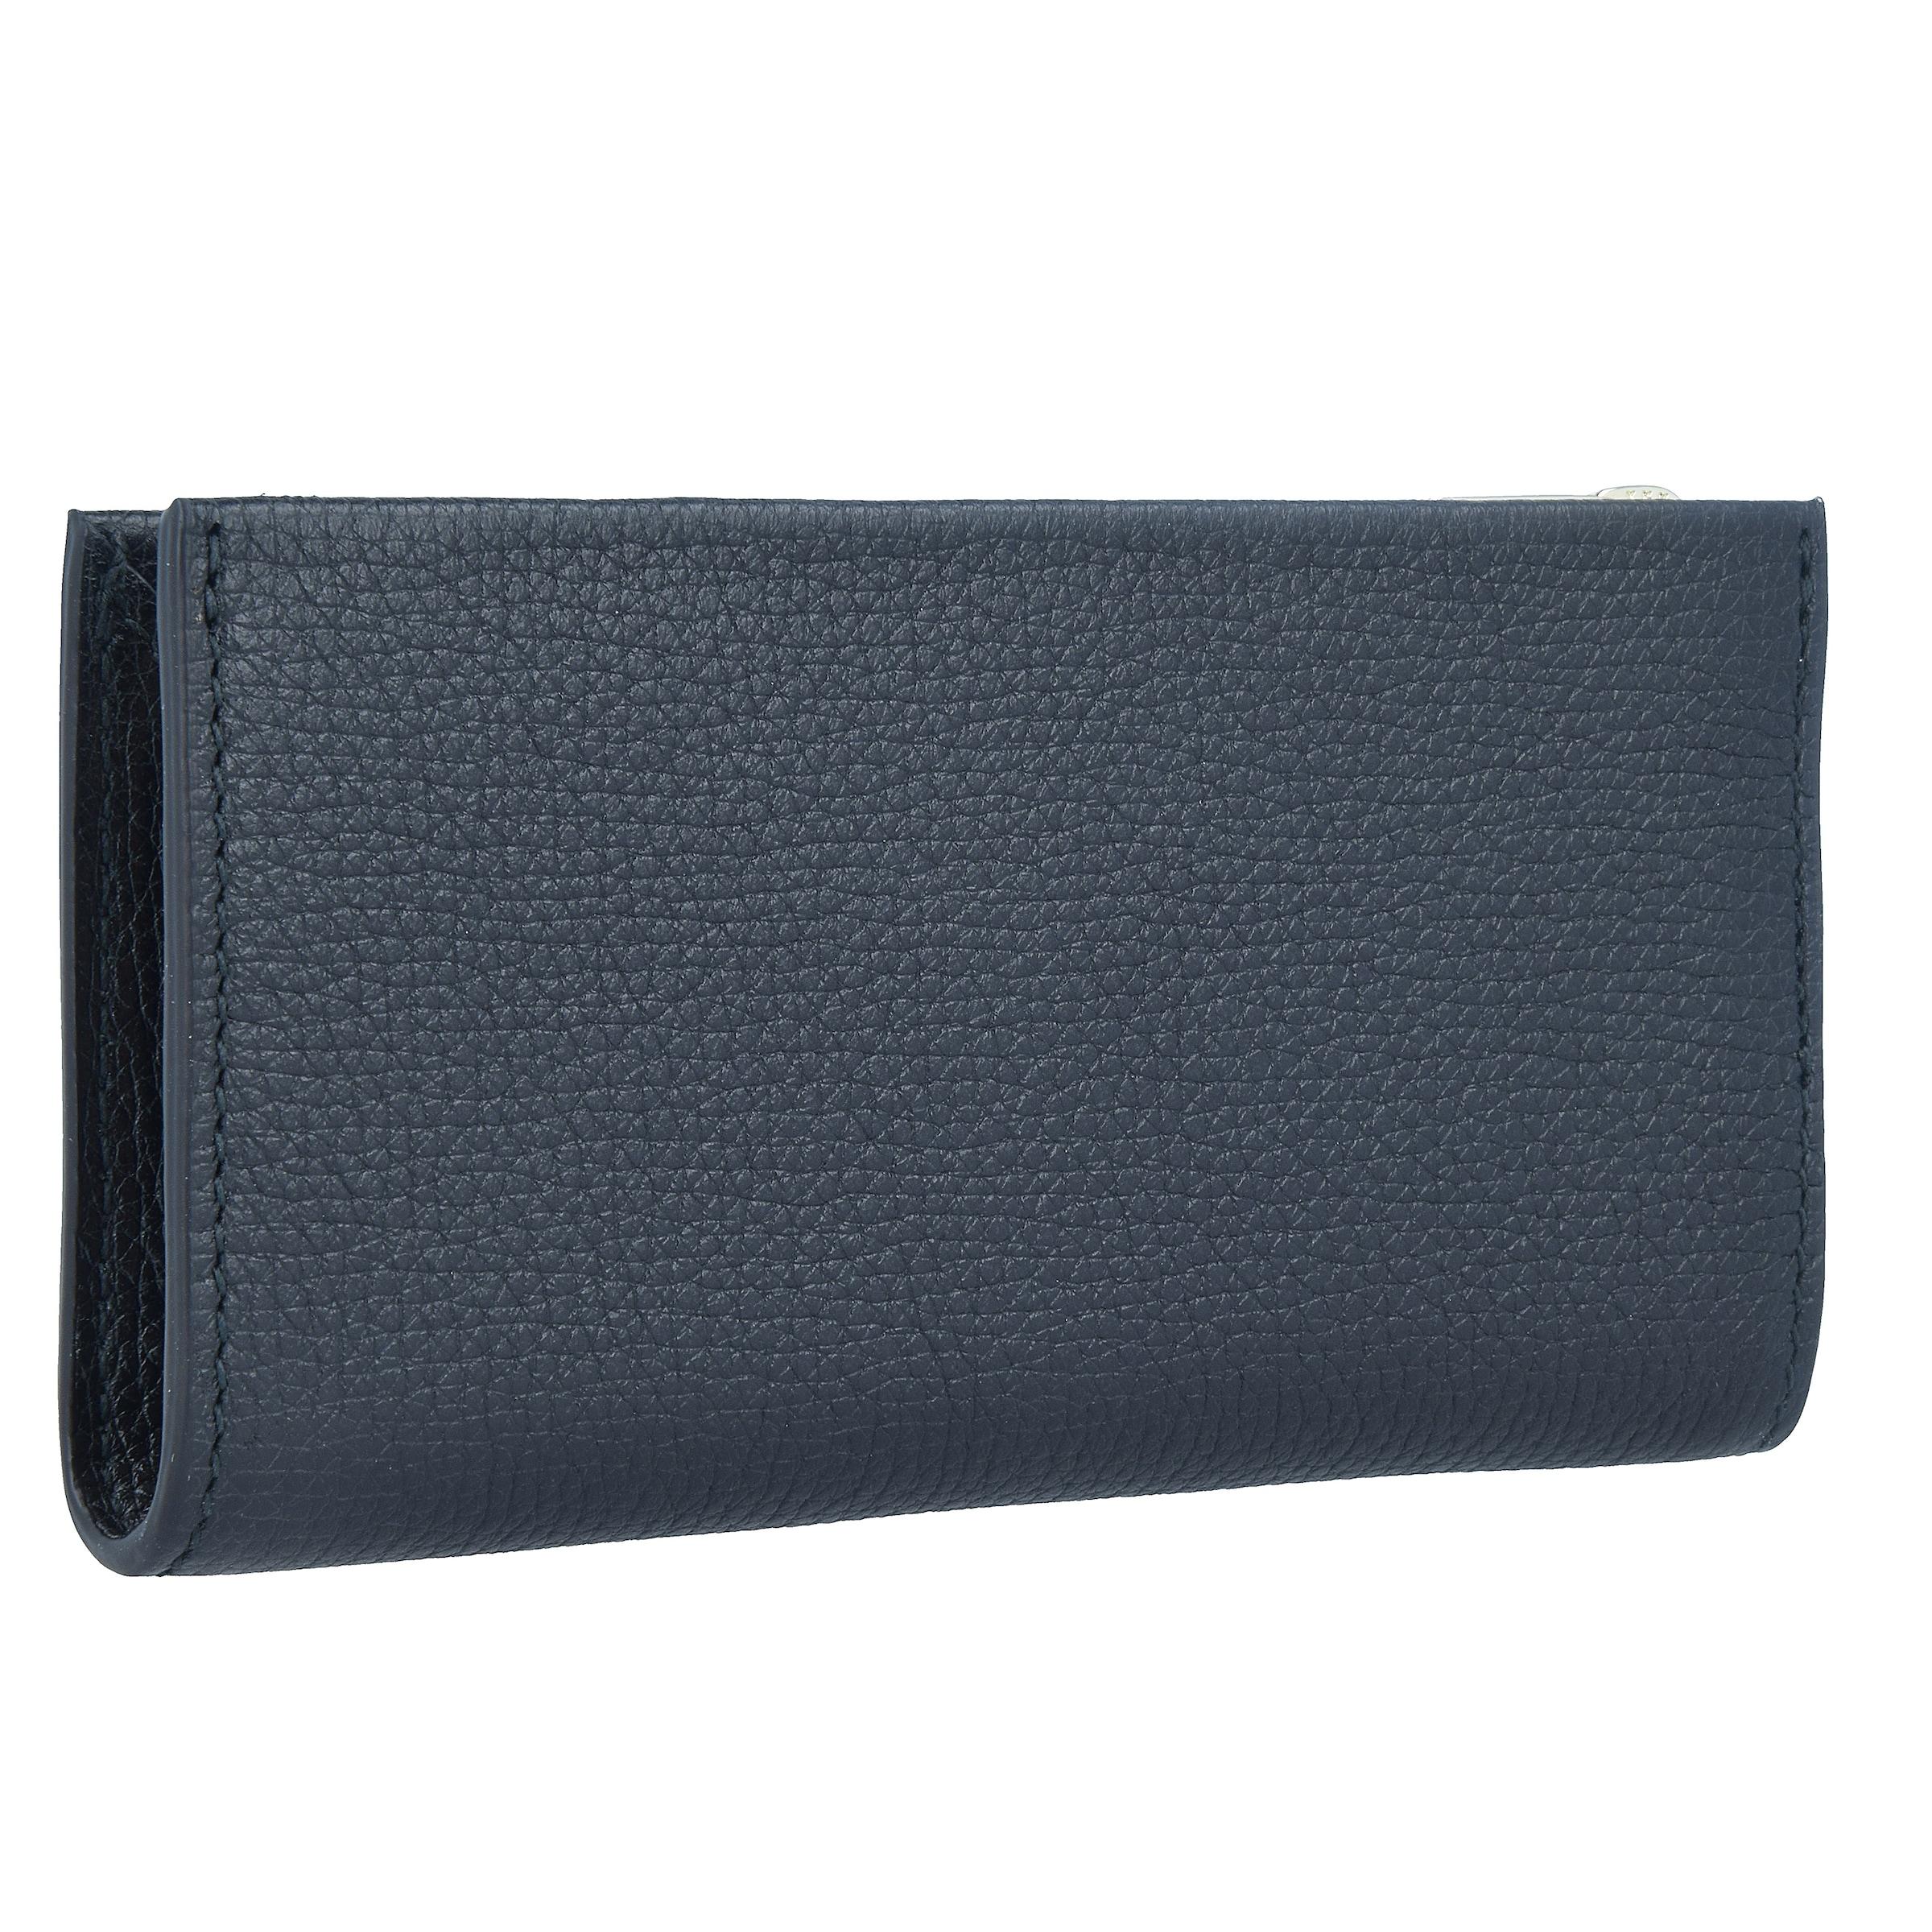 Billig Verkauf Der Neue Ankunft Online-Shopping Mit Mastercard BOSS Taylor Schlüsseletui Leder 13 cm NzPHmJjWqh